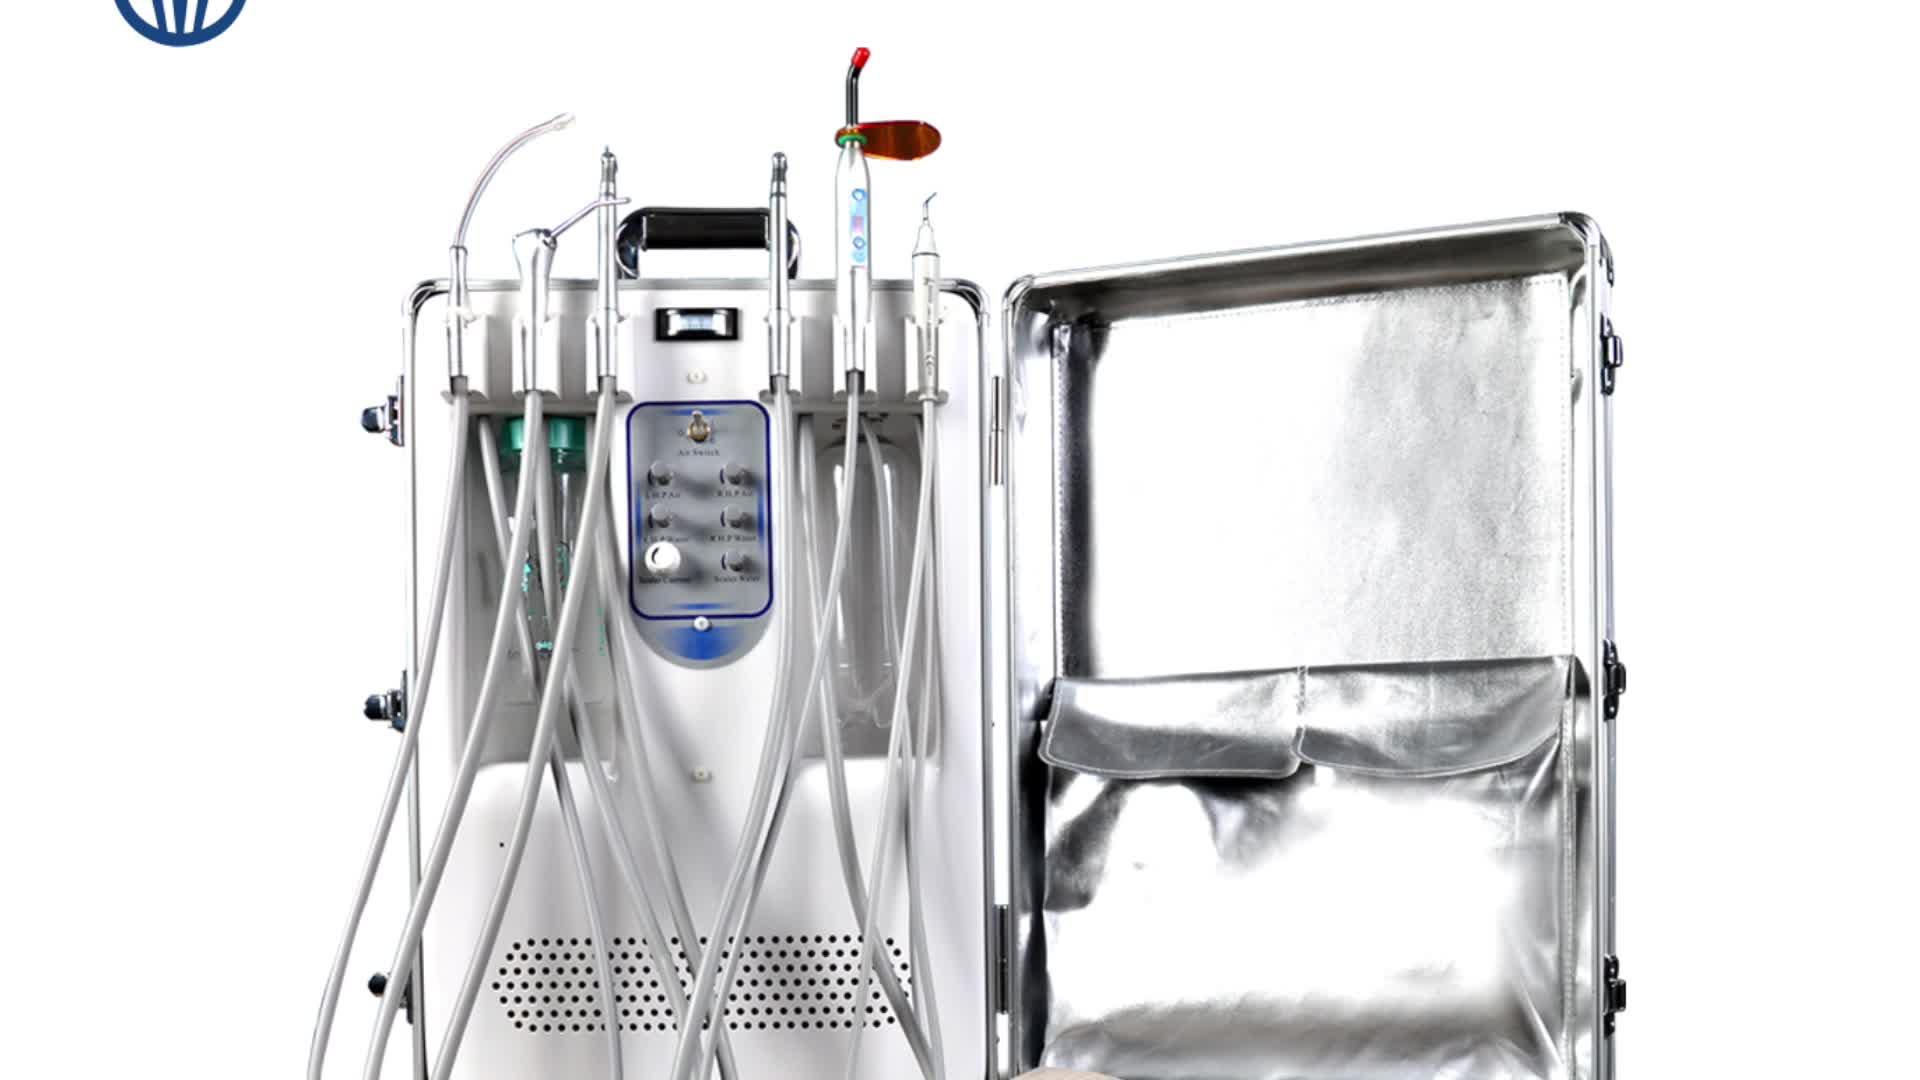 2018 Equipment Portable Dental Unit Mobile Price 550W Mini Suction Air Compressor Dental Chair